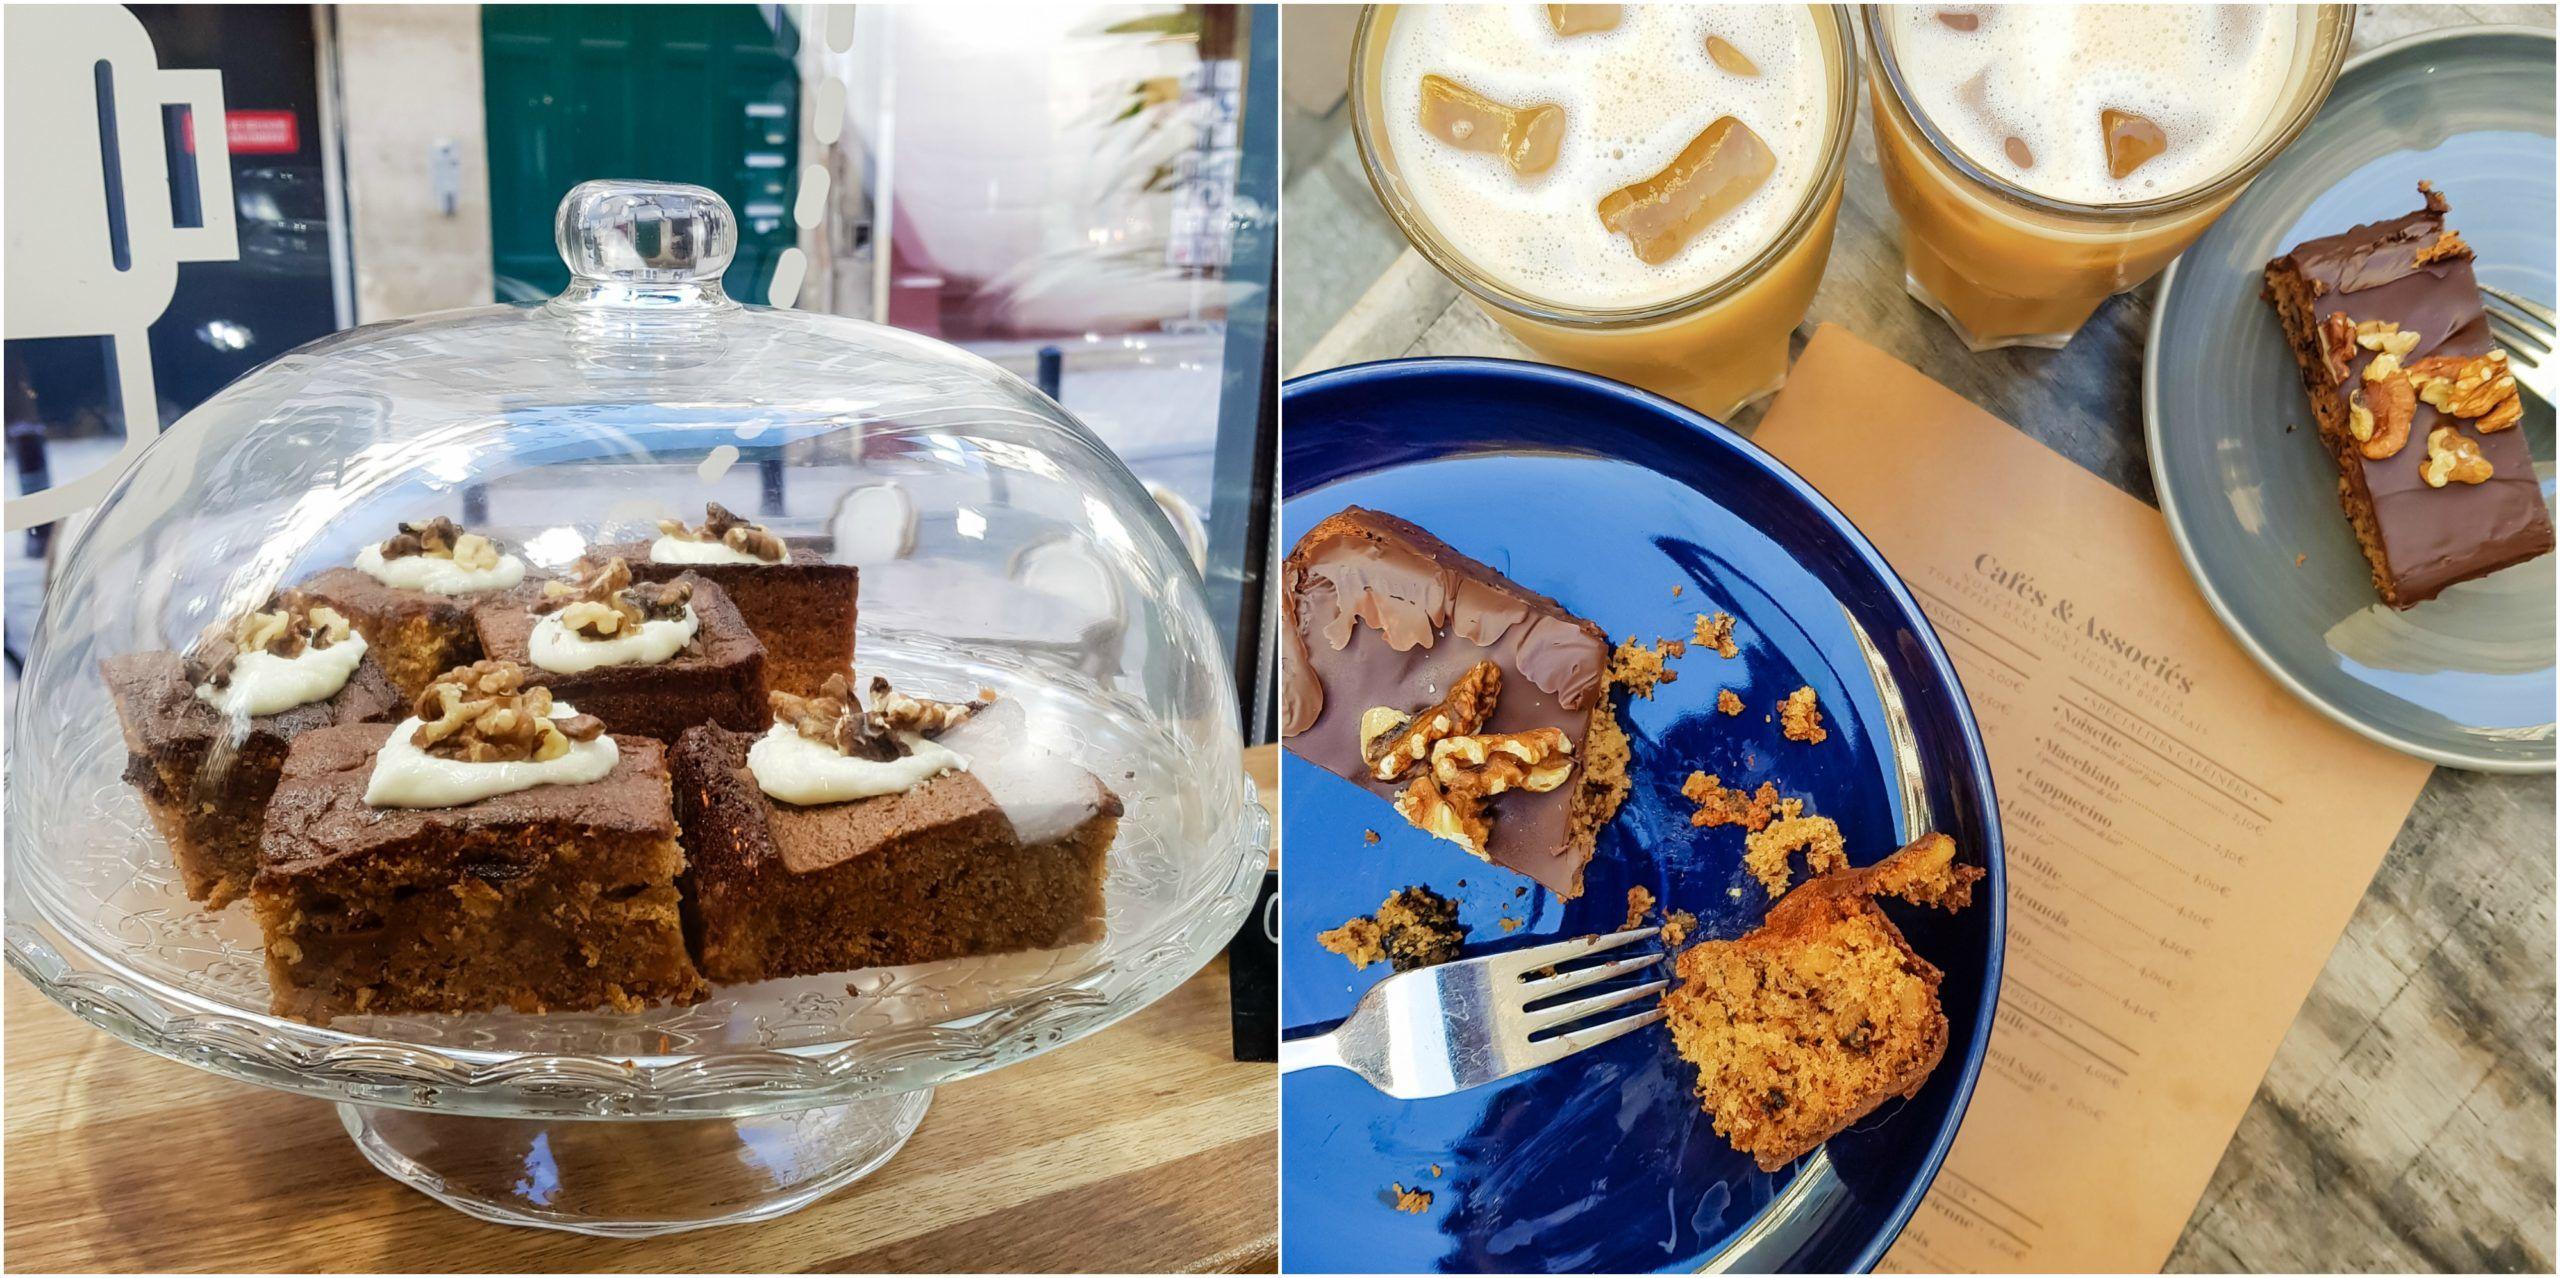 café-vegan-friendly-bordeaux-cake-banana-bread